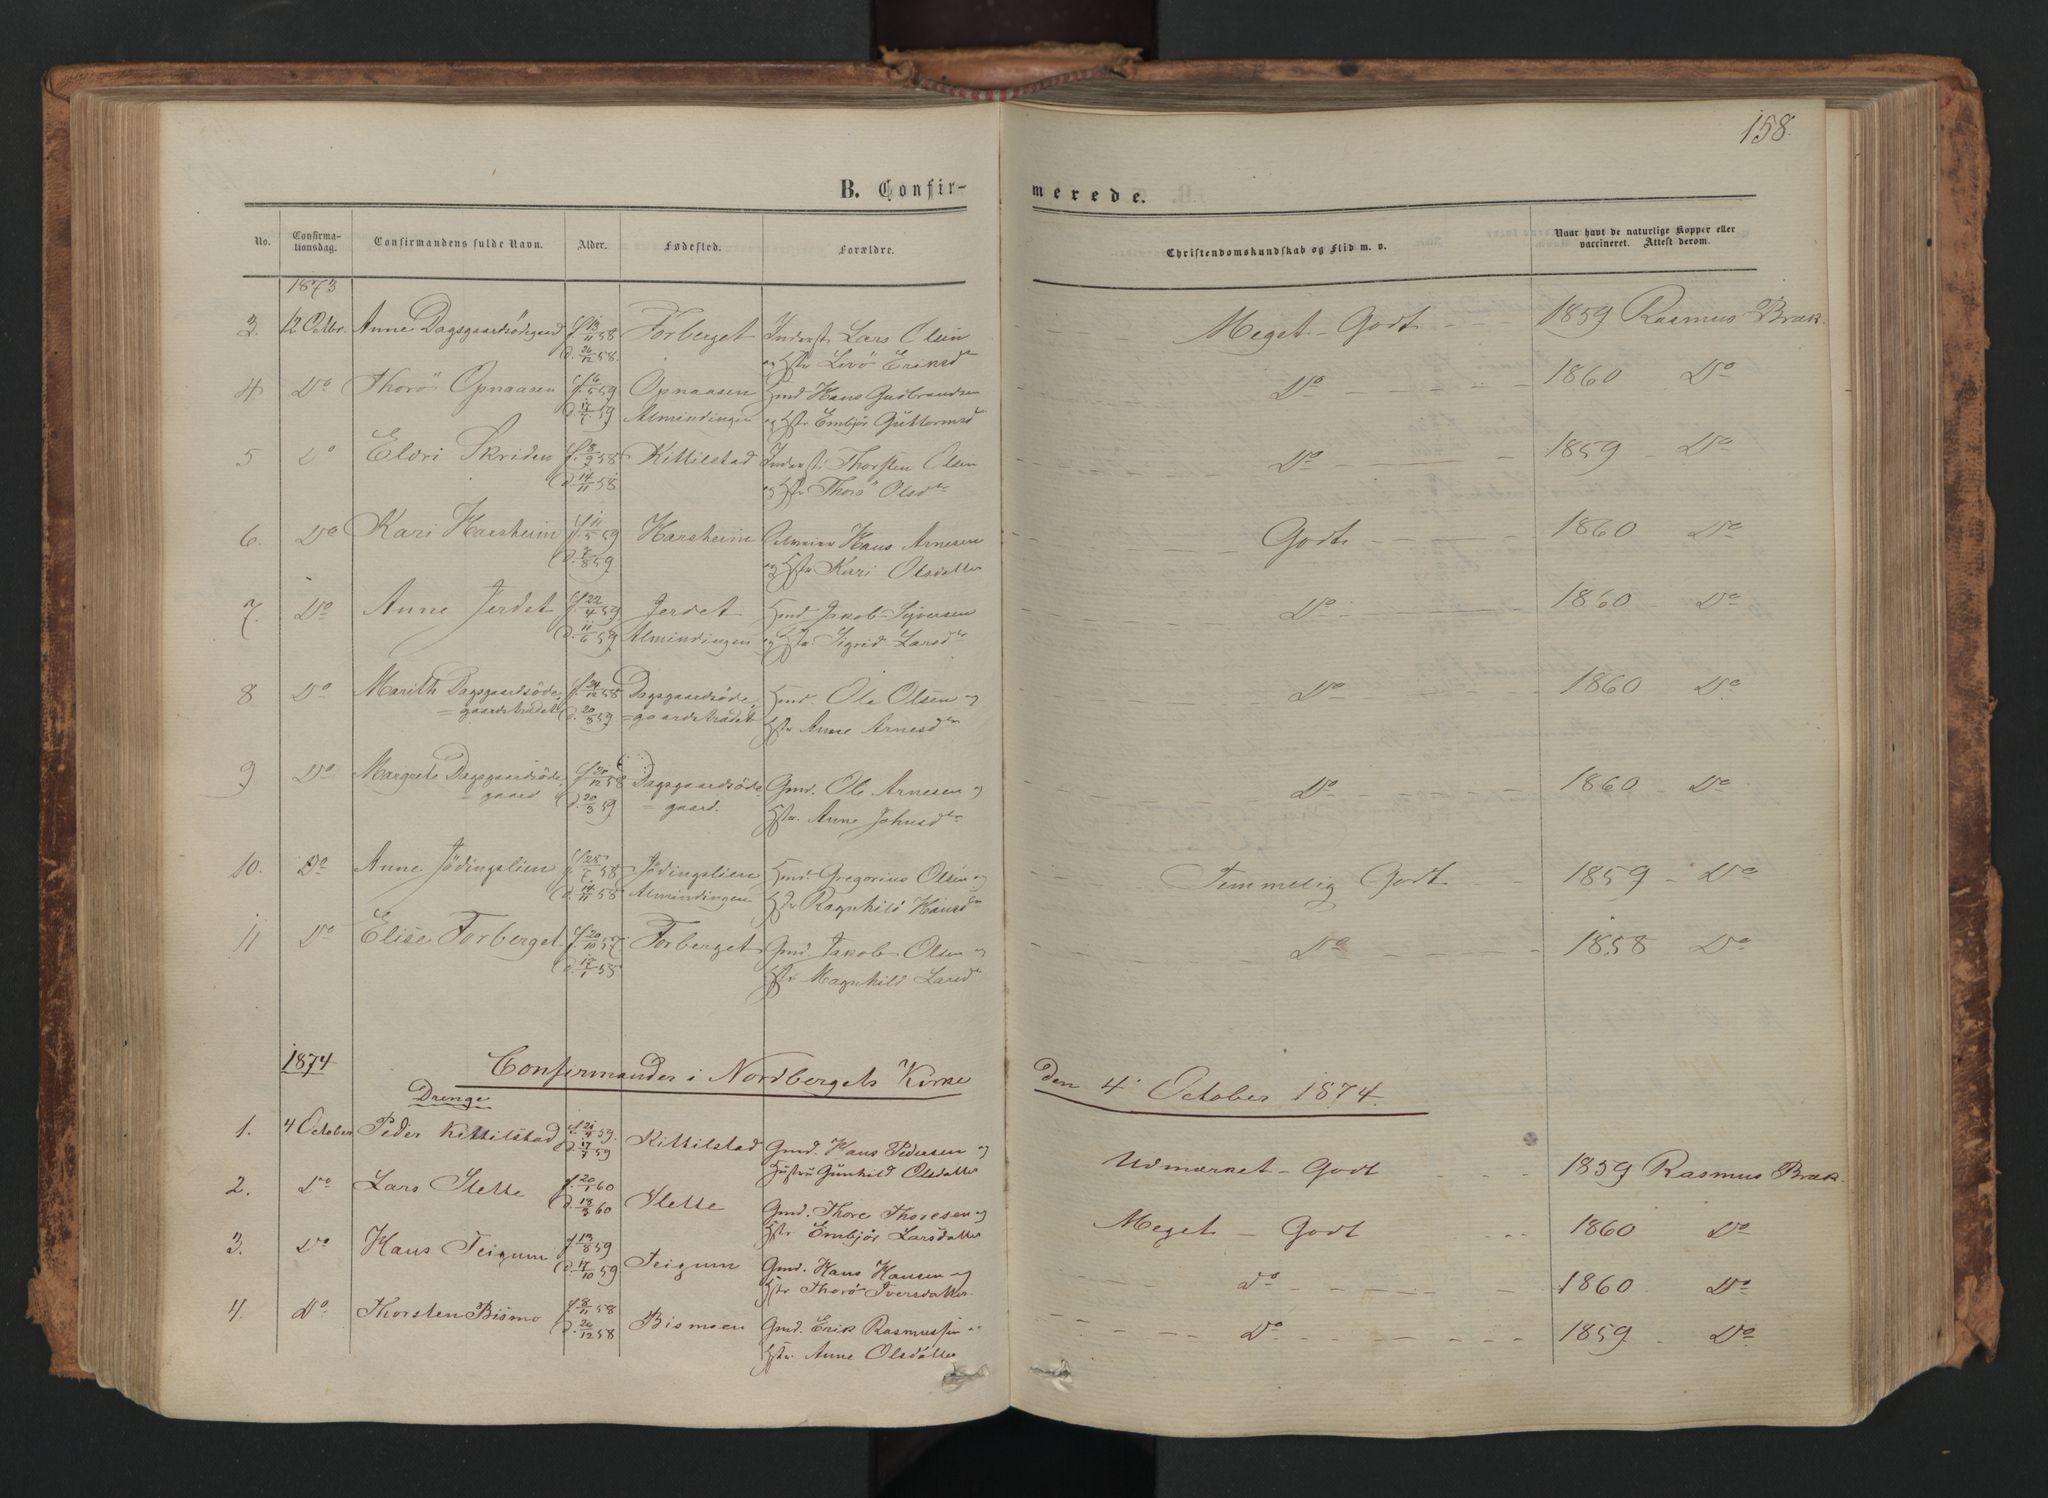 SAH, Skjåk prestekontor, Ministerialbok nr. 1, 1863-1879, s. 158